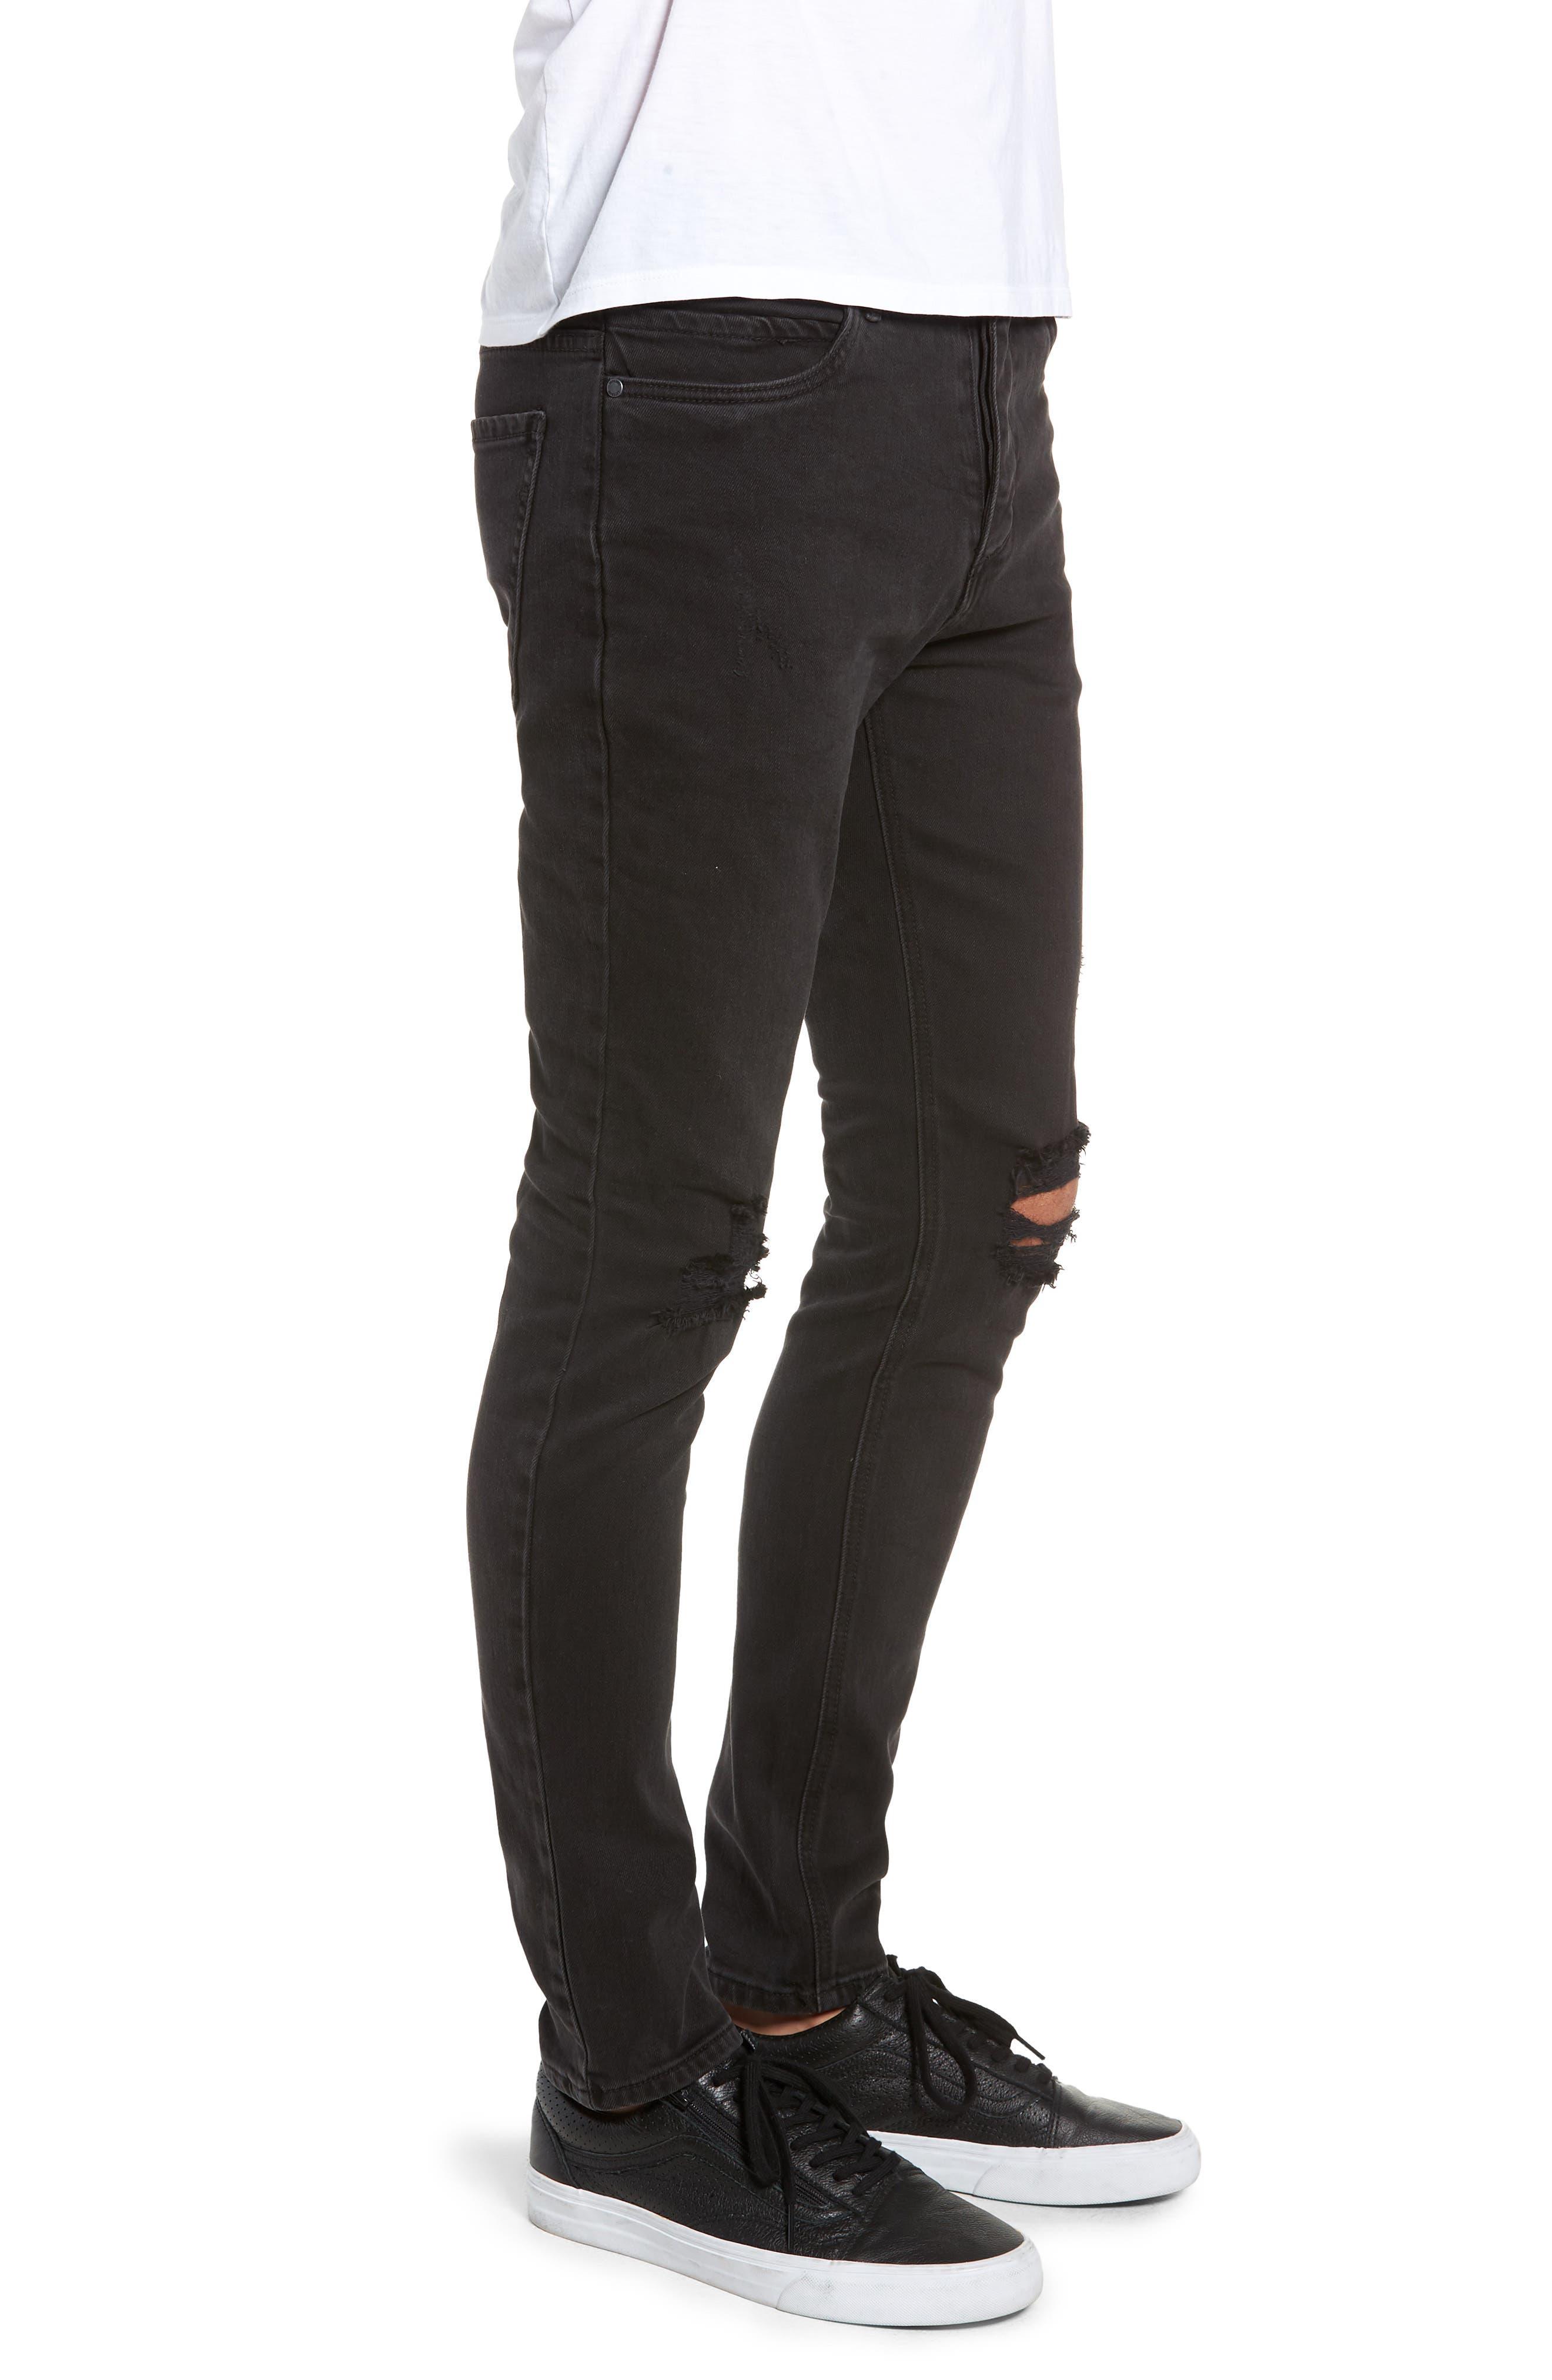 Joe Blow Slim Fit Jeans,                             Alternate thumbnail 3, color,                             BUSTED BLACK